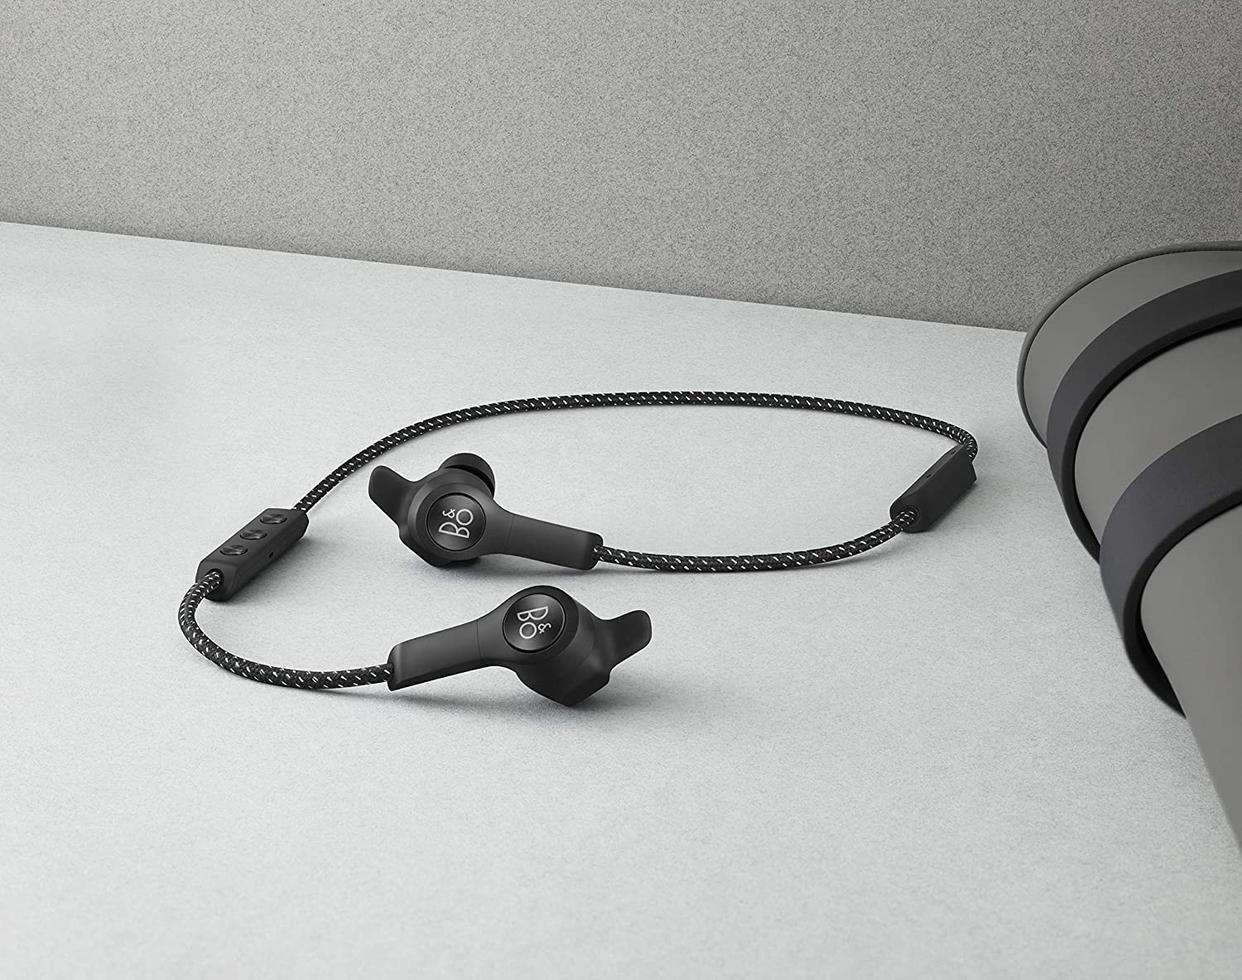 Bang&Olufsen(バング&オルフセン) Beoplay E6 Bluetooth 1645308の商品画像9